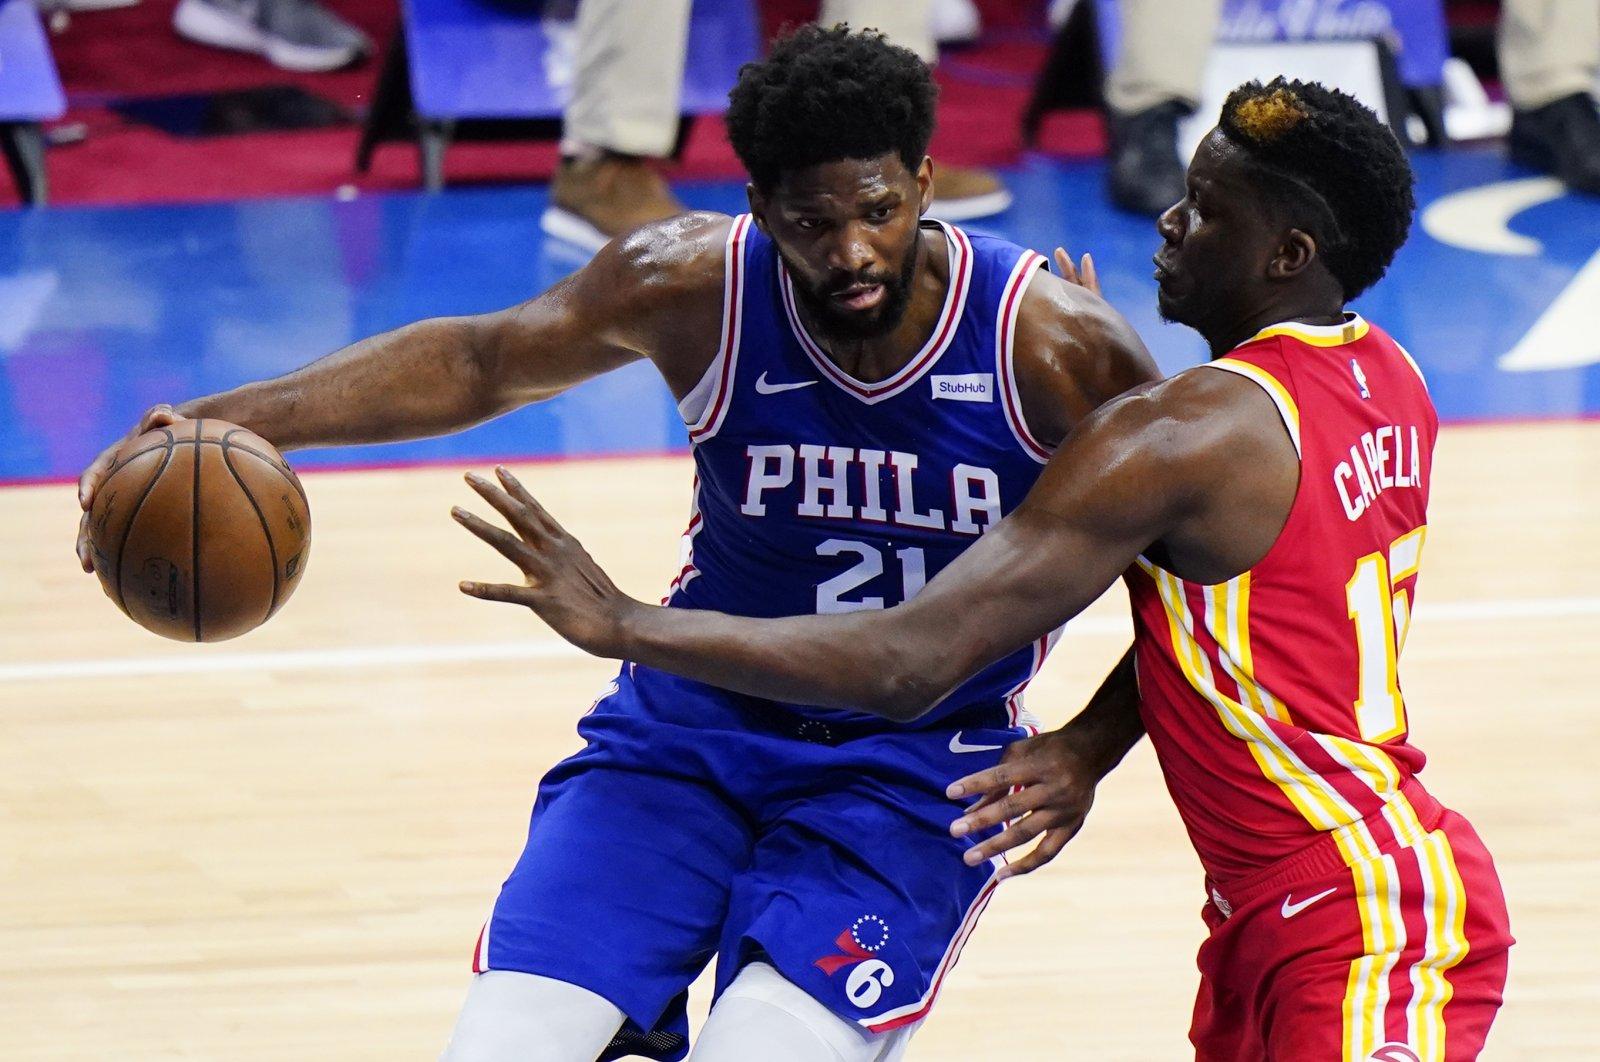 Philadelphia 76ers' Joel Embiid (L) tries to get past Atlanta Hawks' Clint Capela during Game 2 of their second-round NBA Playoffs series, Philadelphia, U.S., June 8, 2021. (AP Photo)